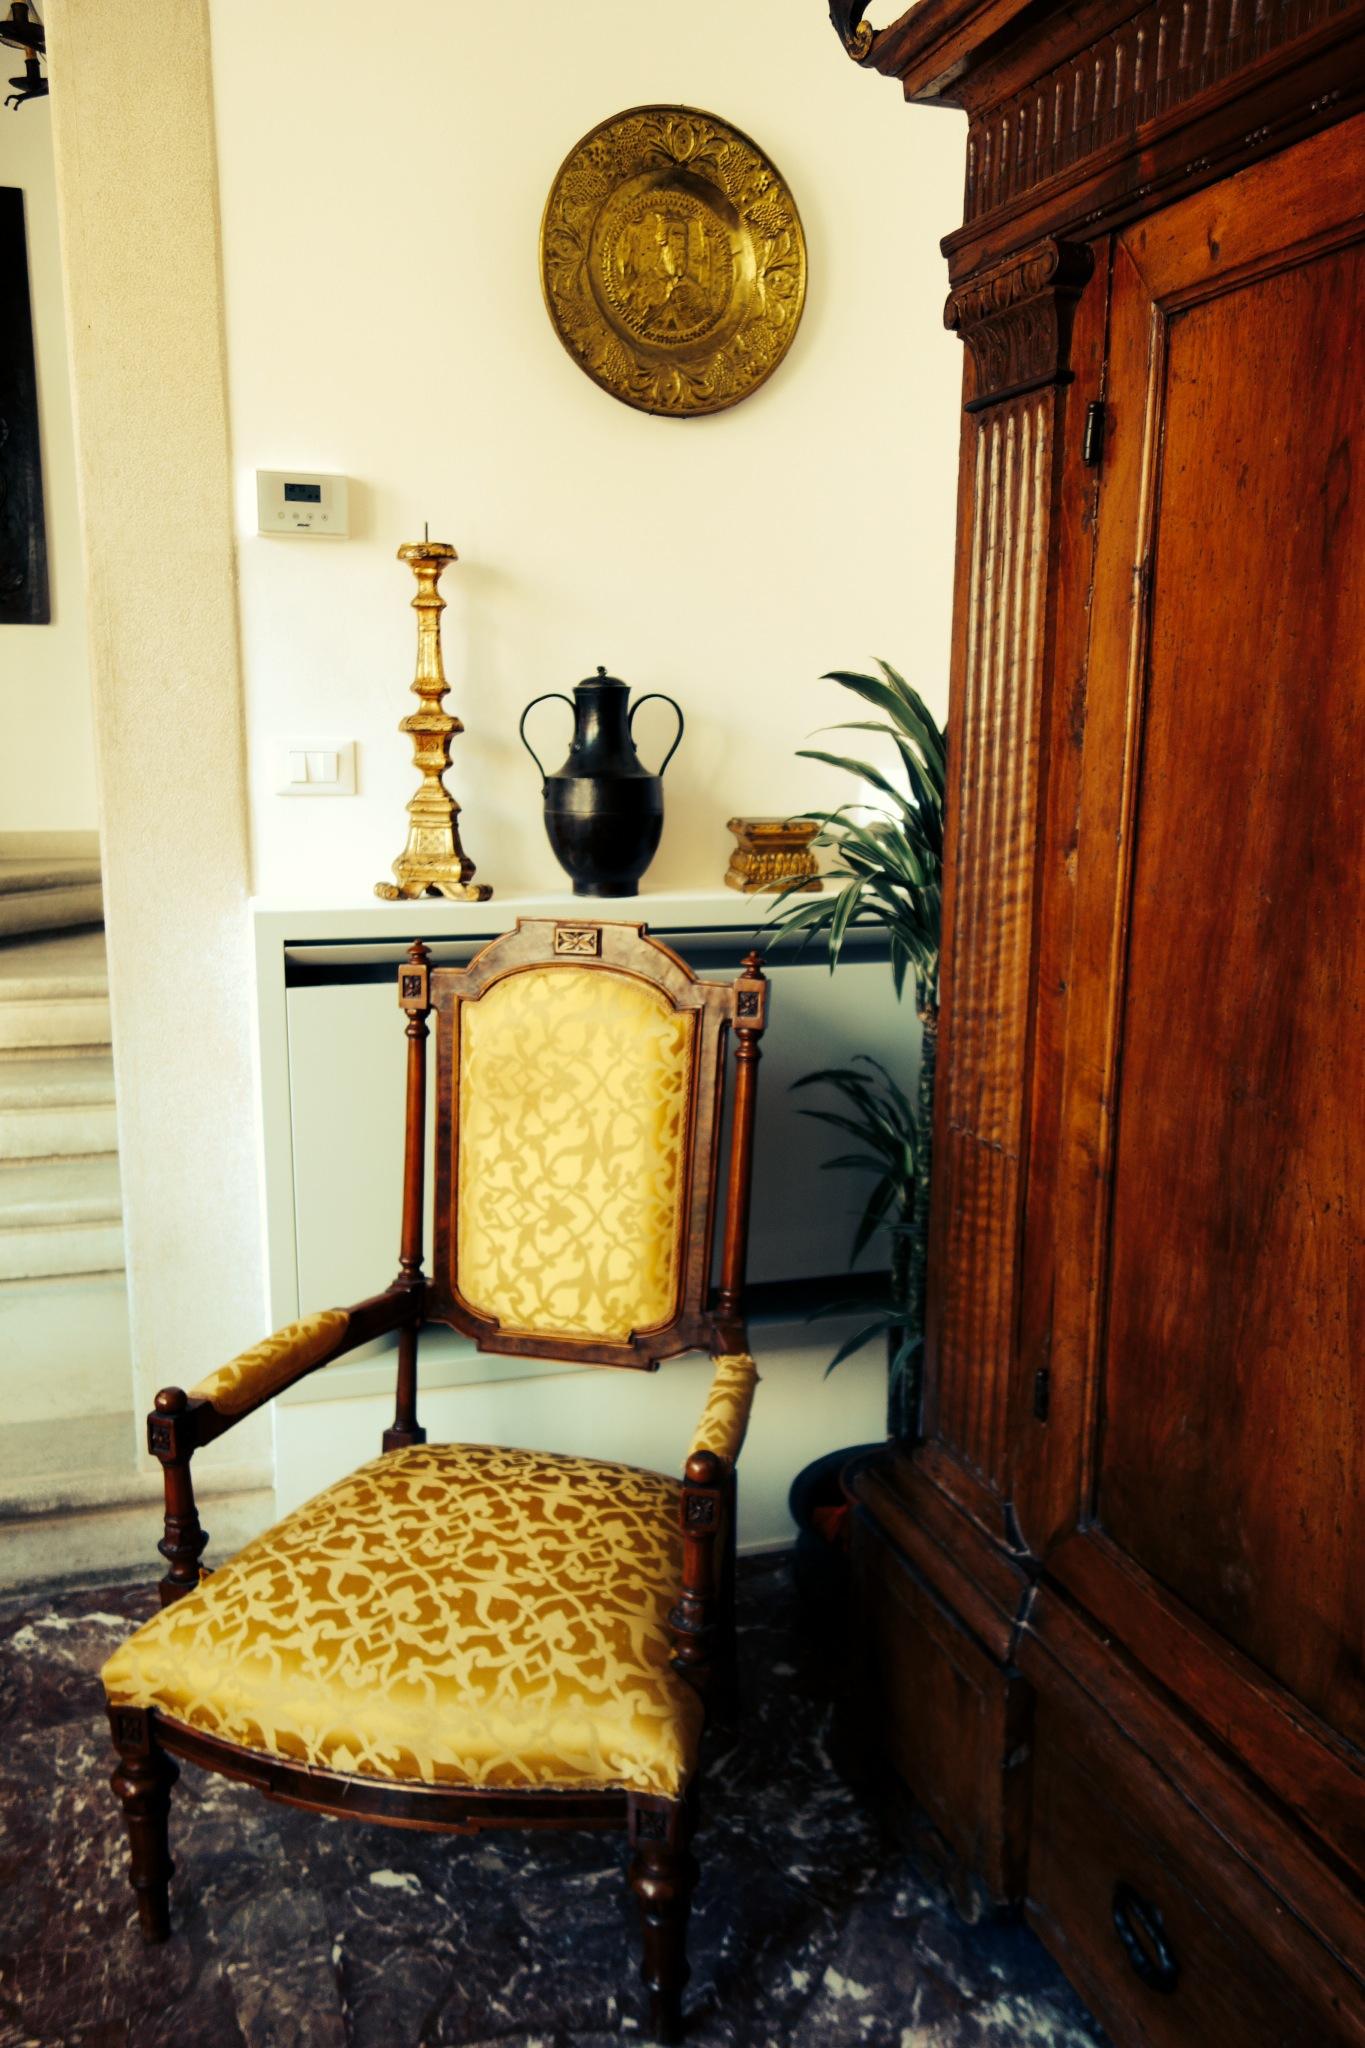 Venetian Antiques, Italian Antiques, Decorating with Antiques, O&C Antiques